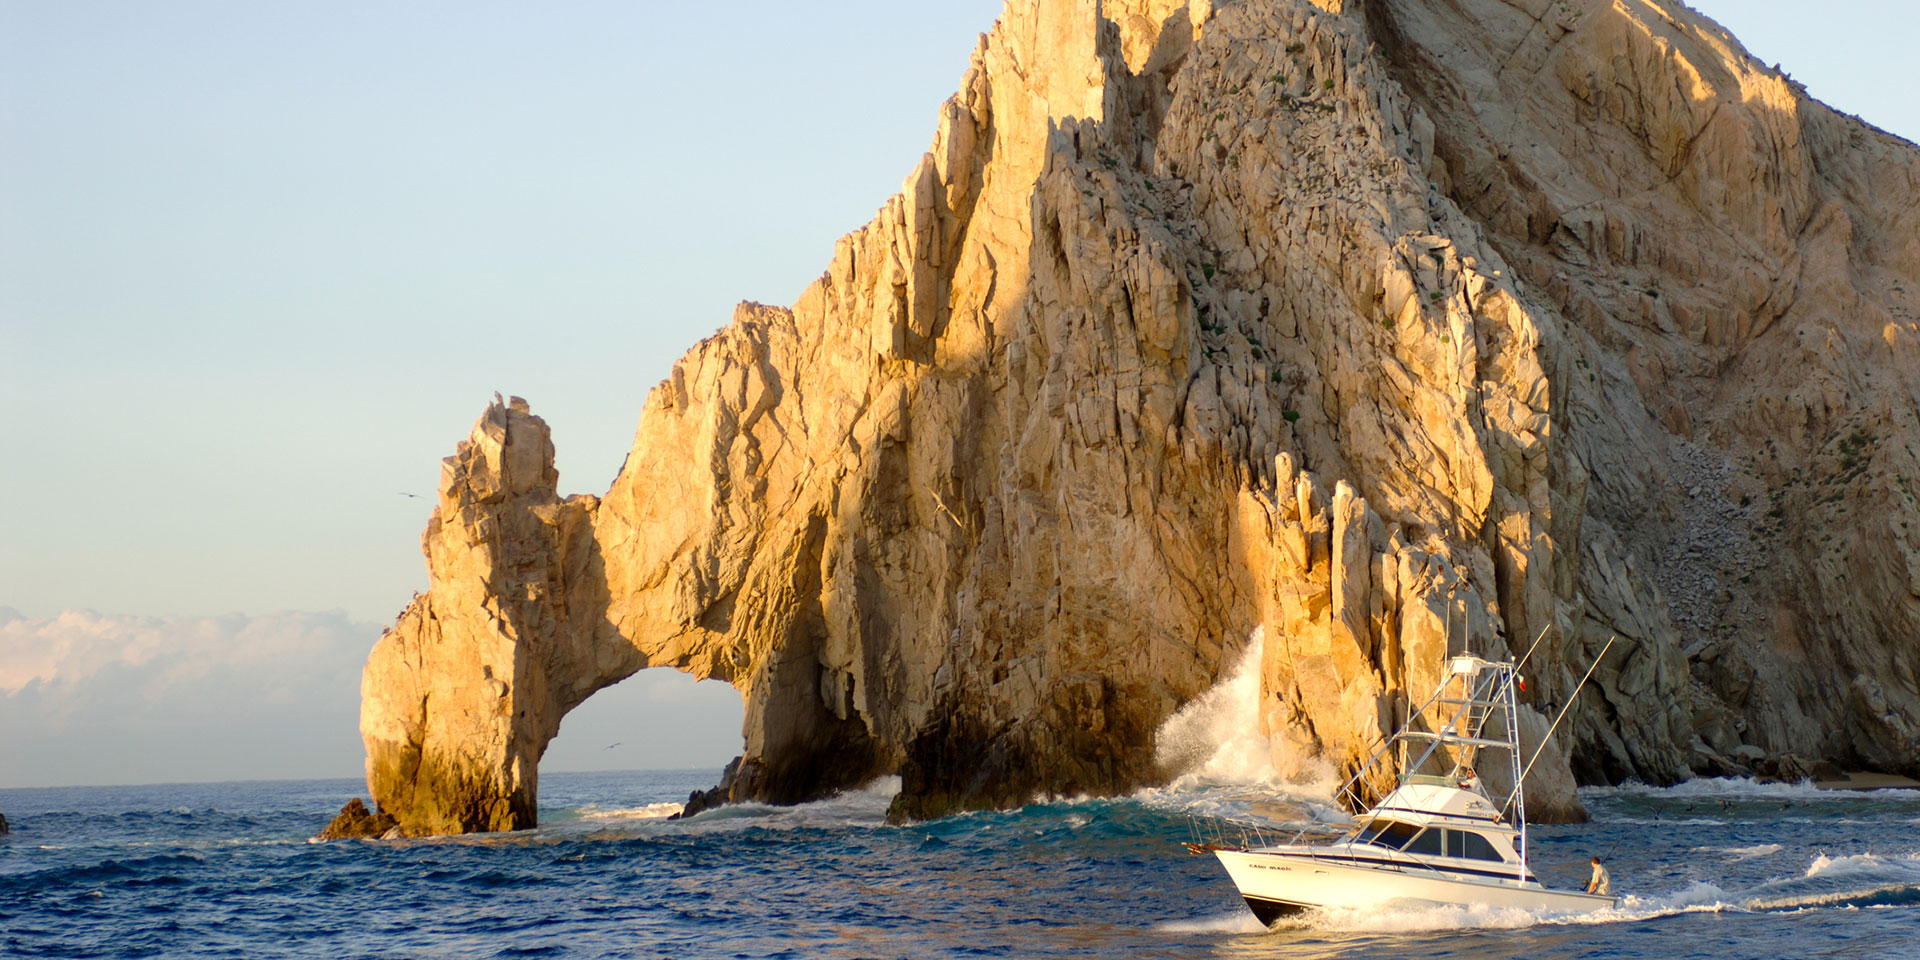 MARRIOTT TRAVELER - Explora Los Cabos en Yate     Photo credit: Getty Images